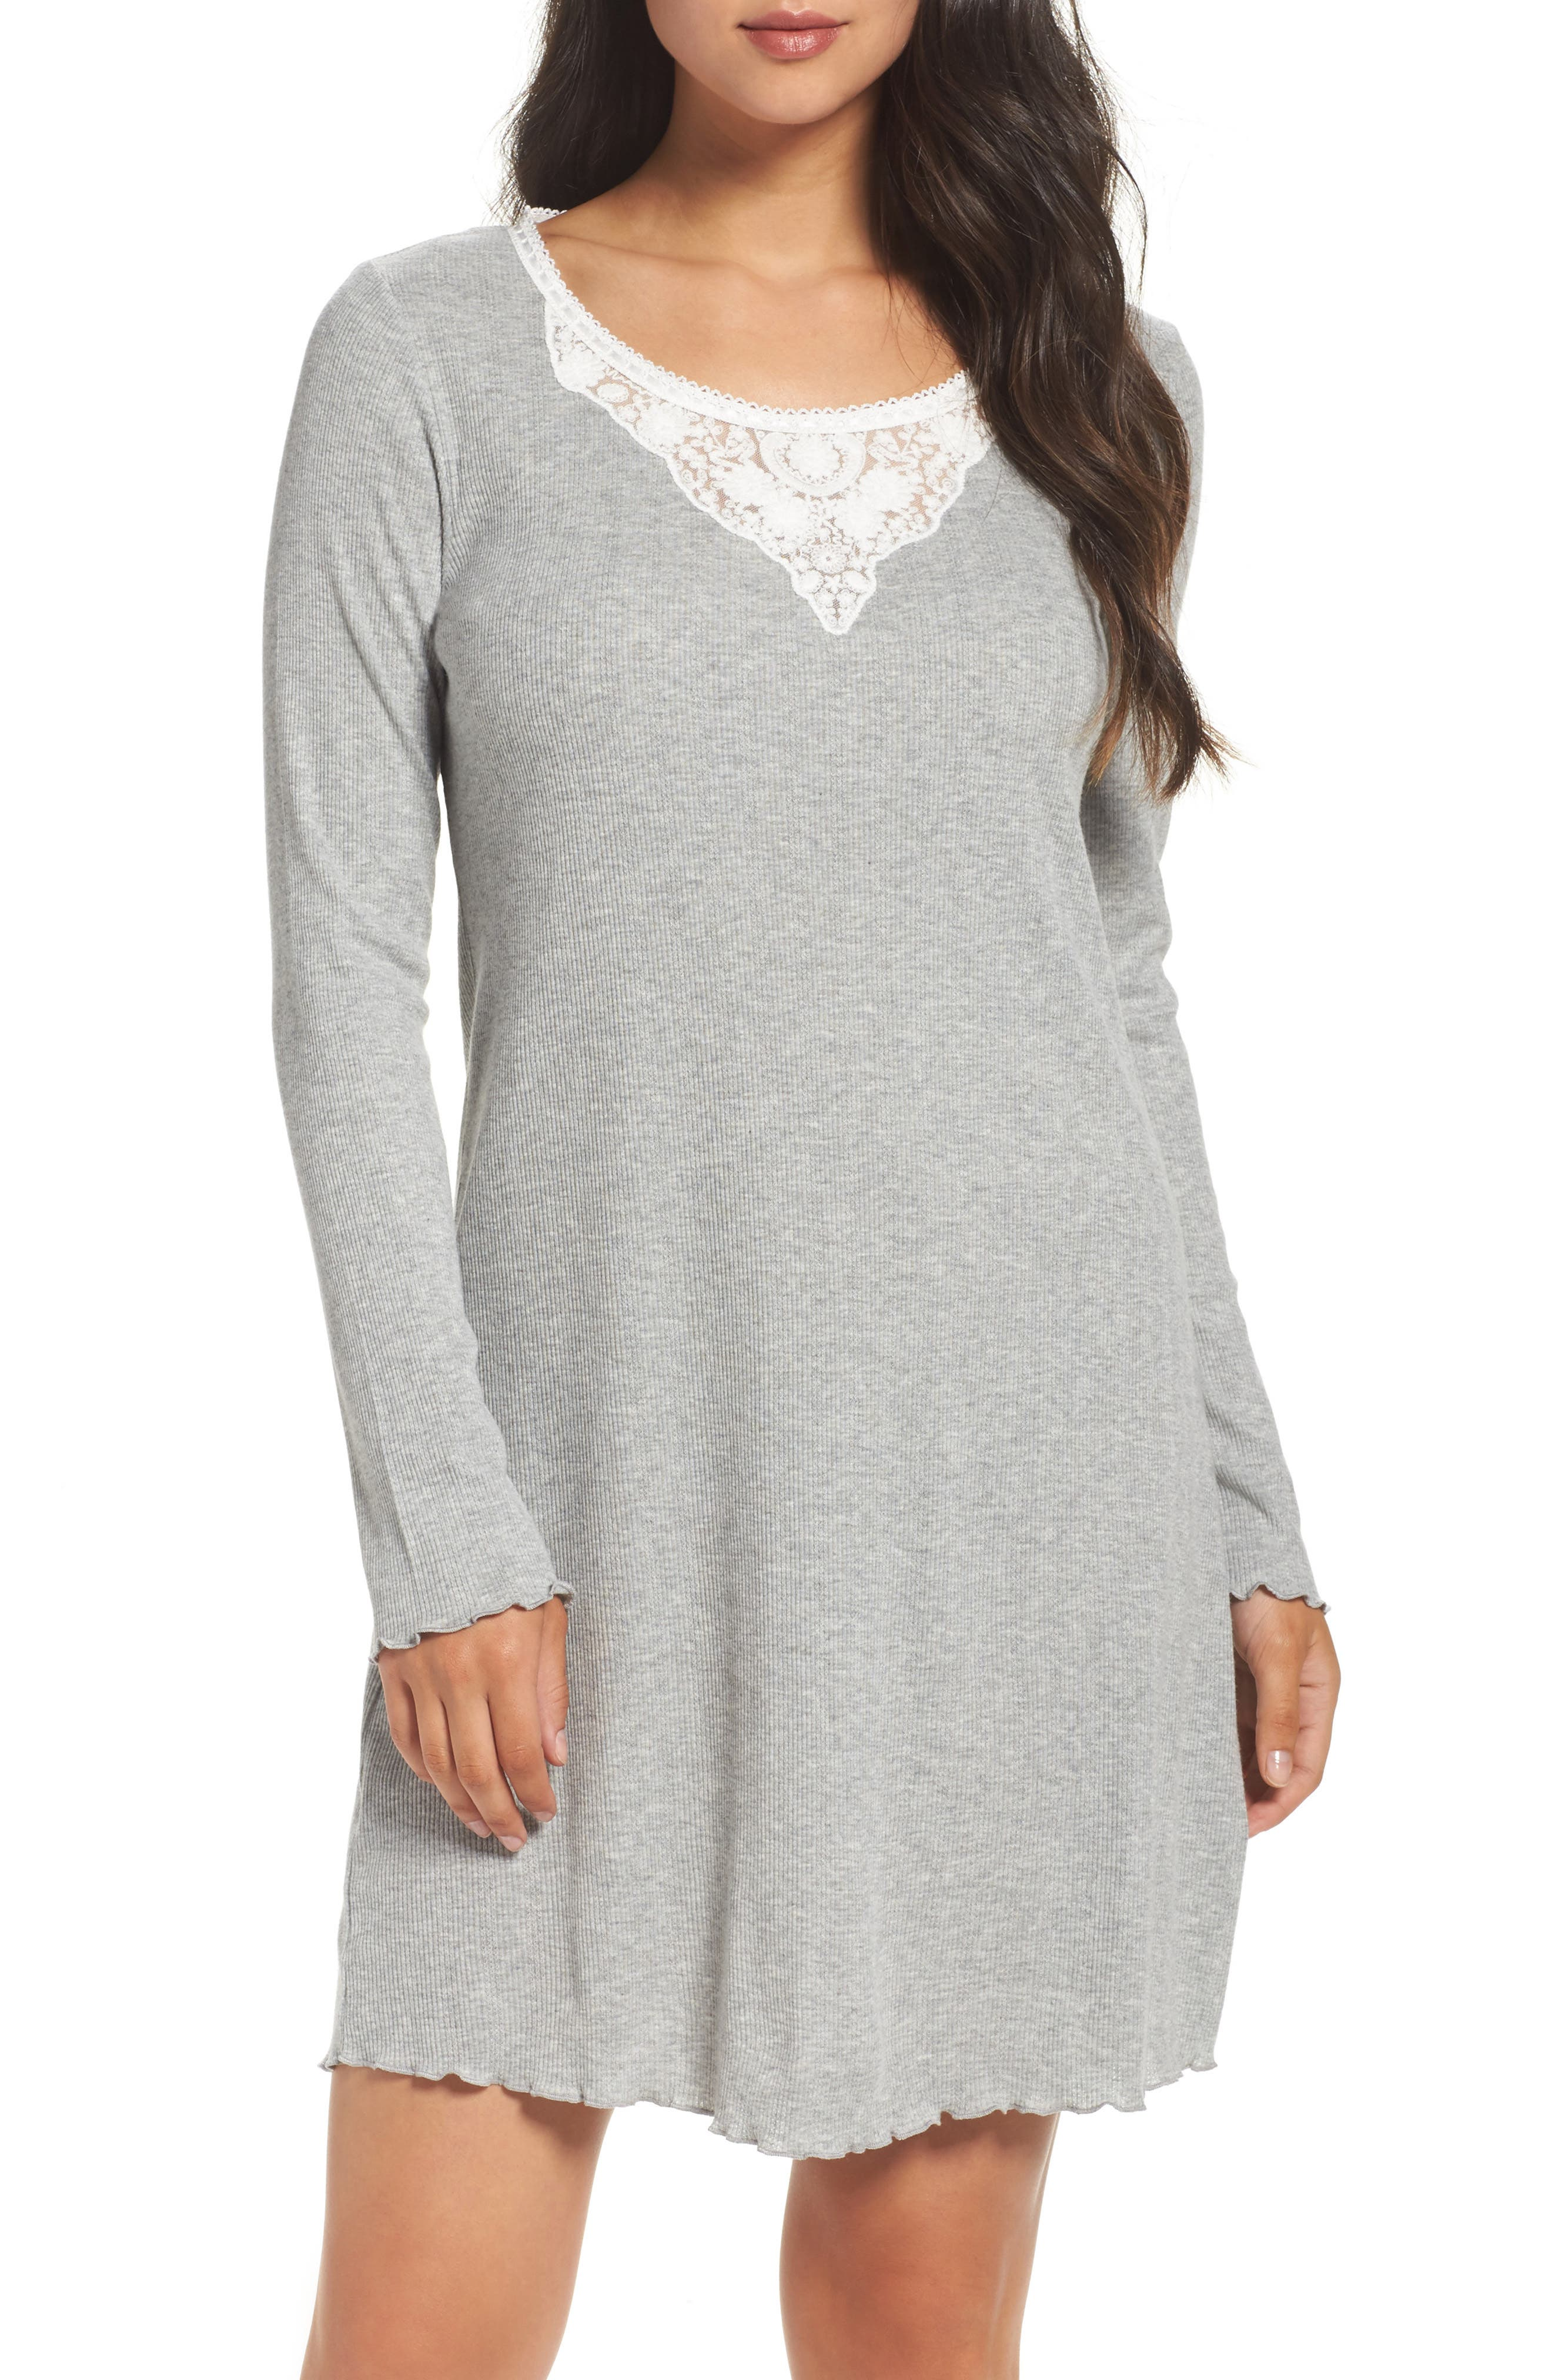 Lace Neck Sleep Shirt,                             Main thumbnail 1, color,                             022